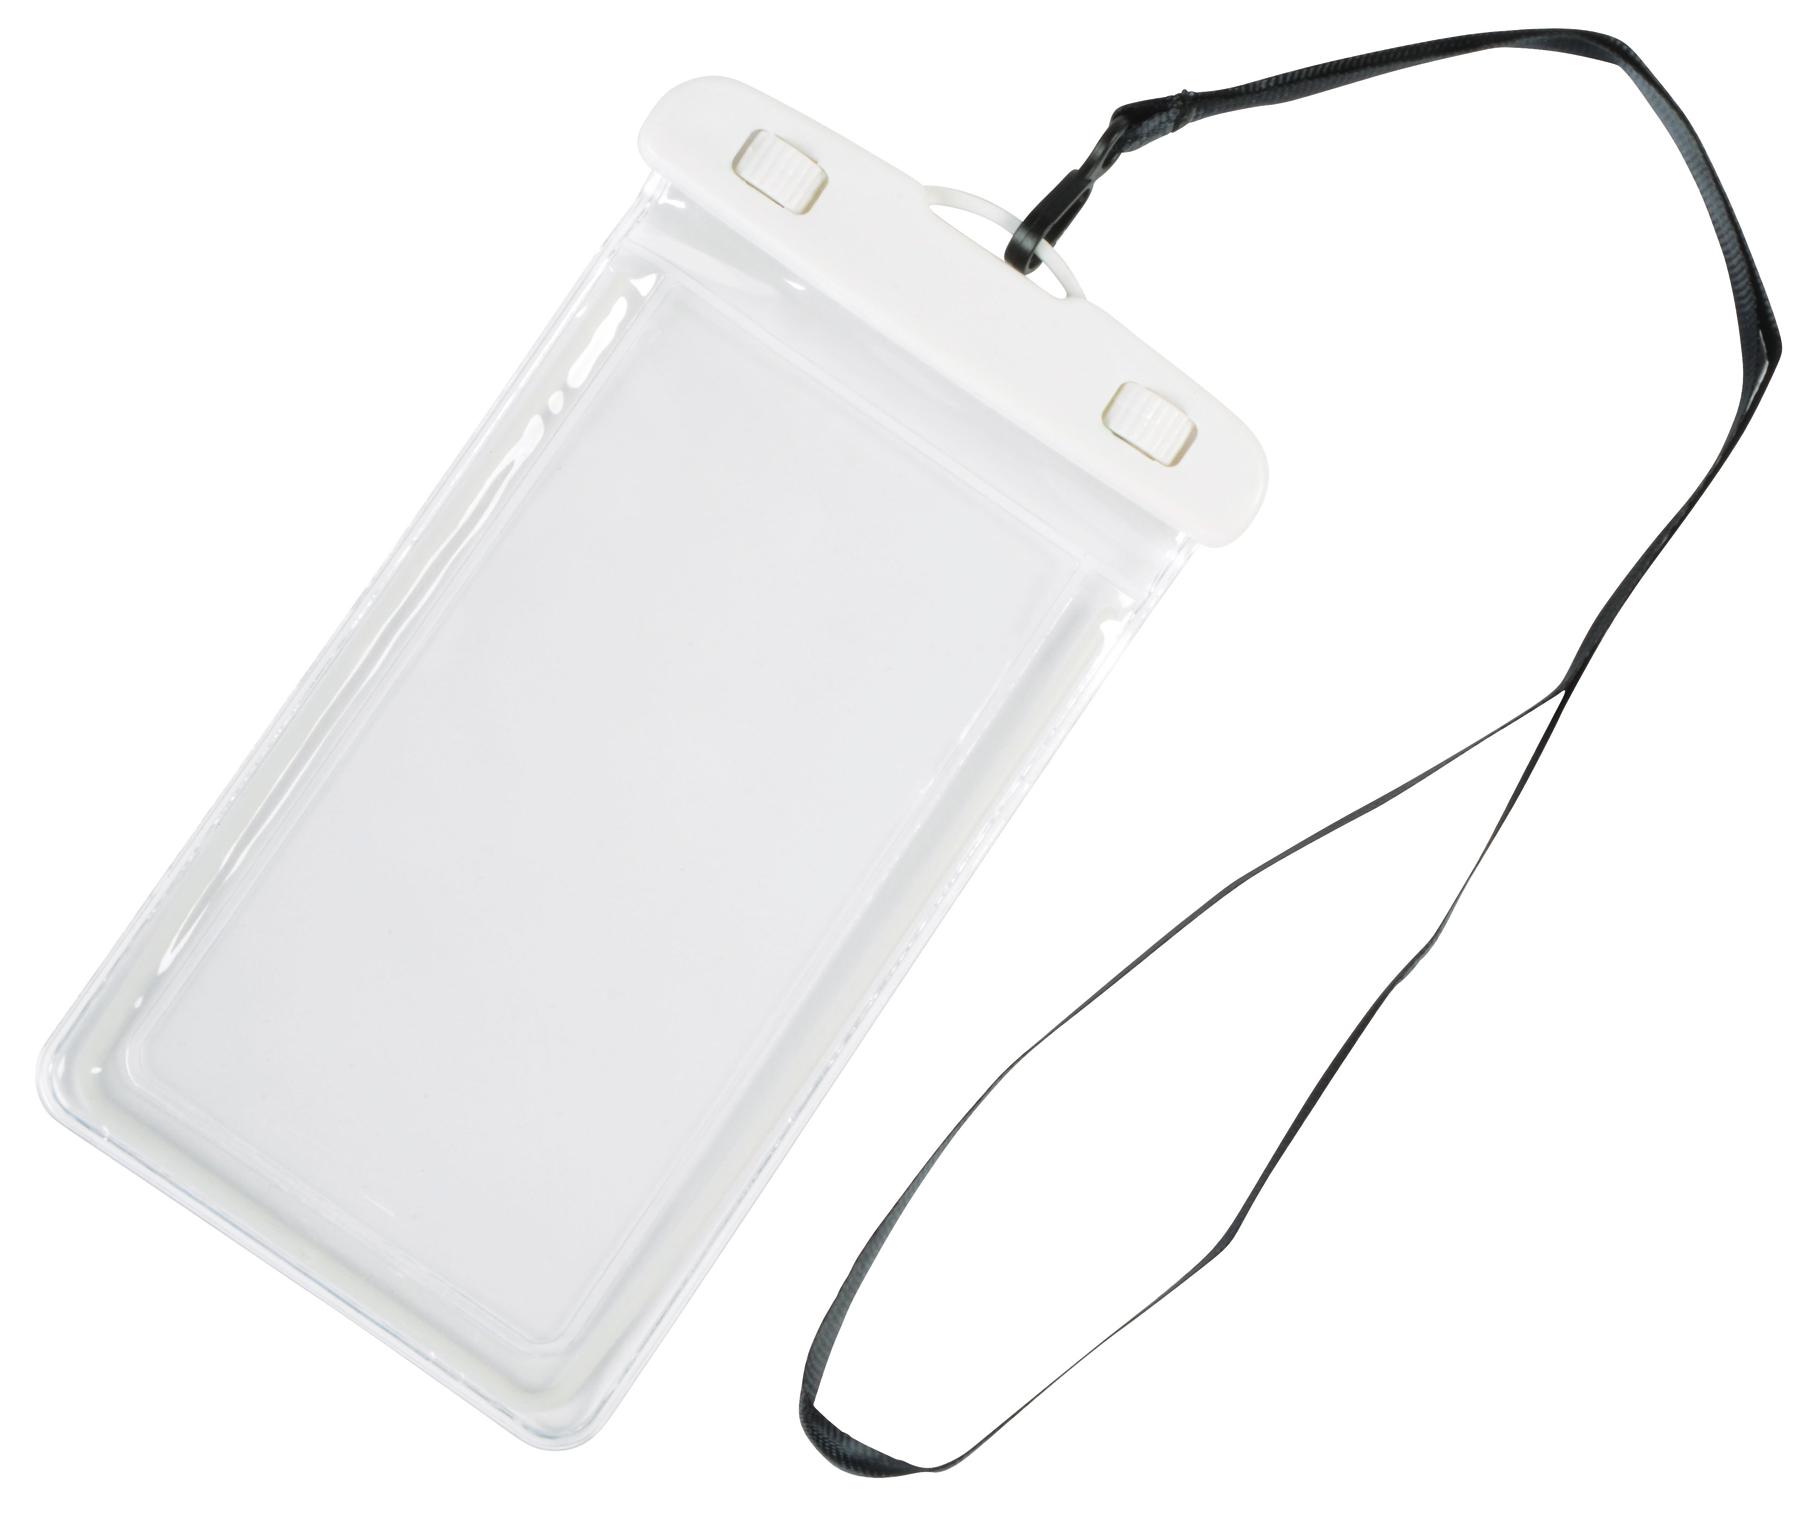 Torebka na telefon DIVER, biały, transparentny